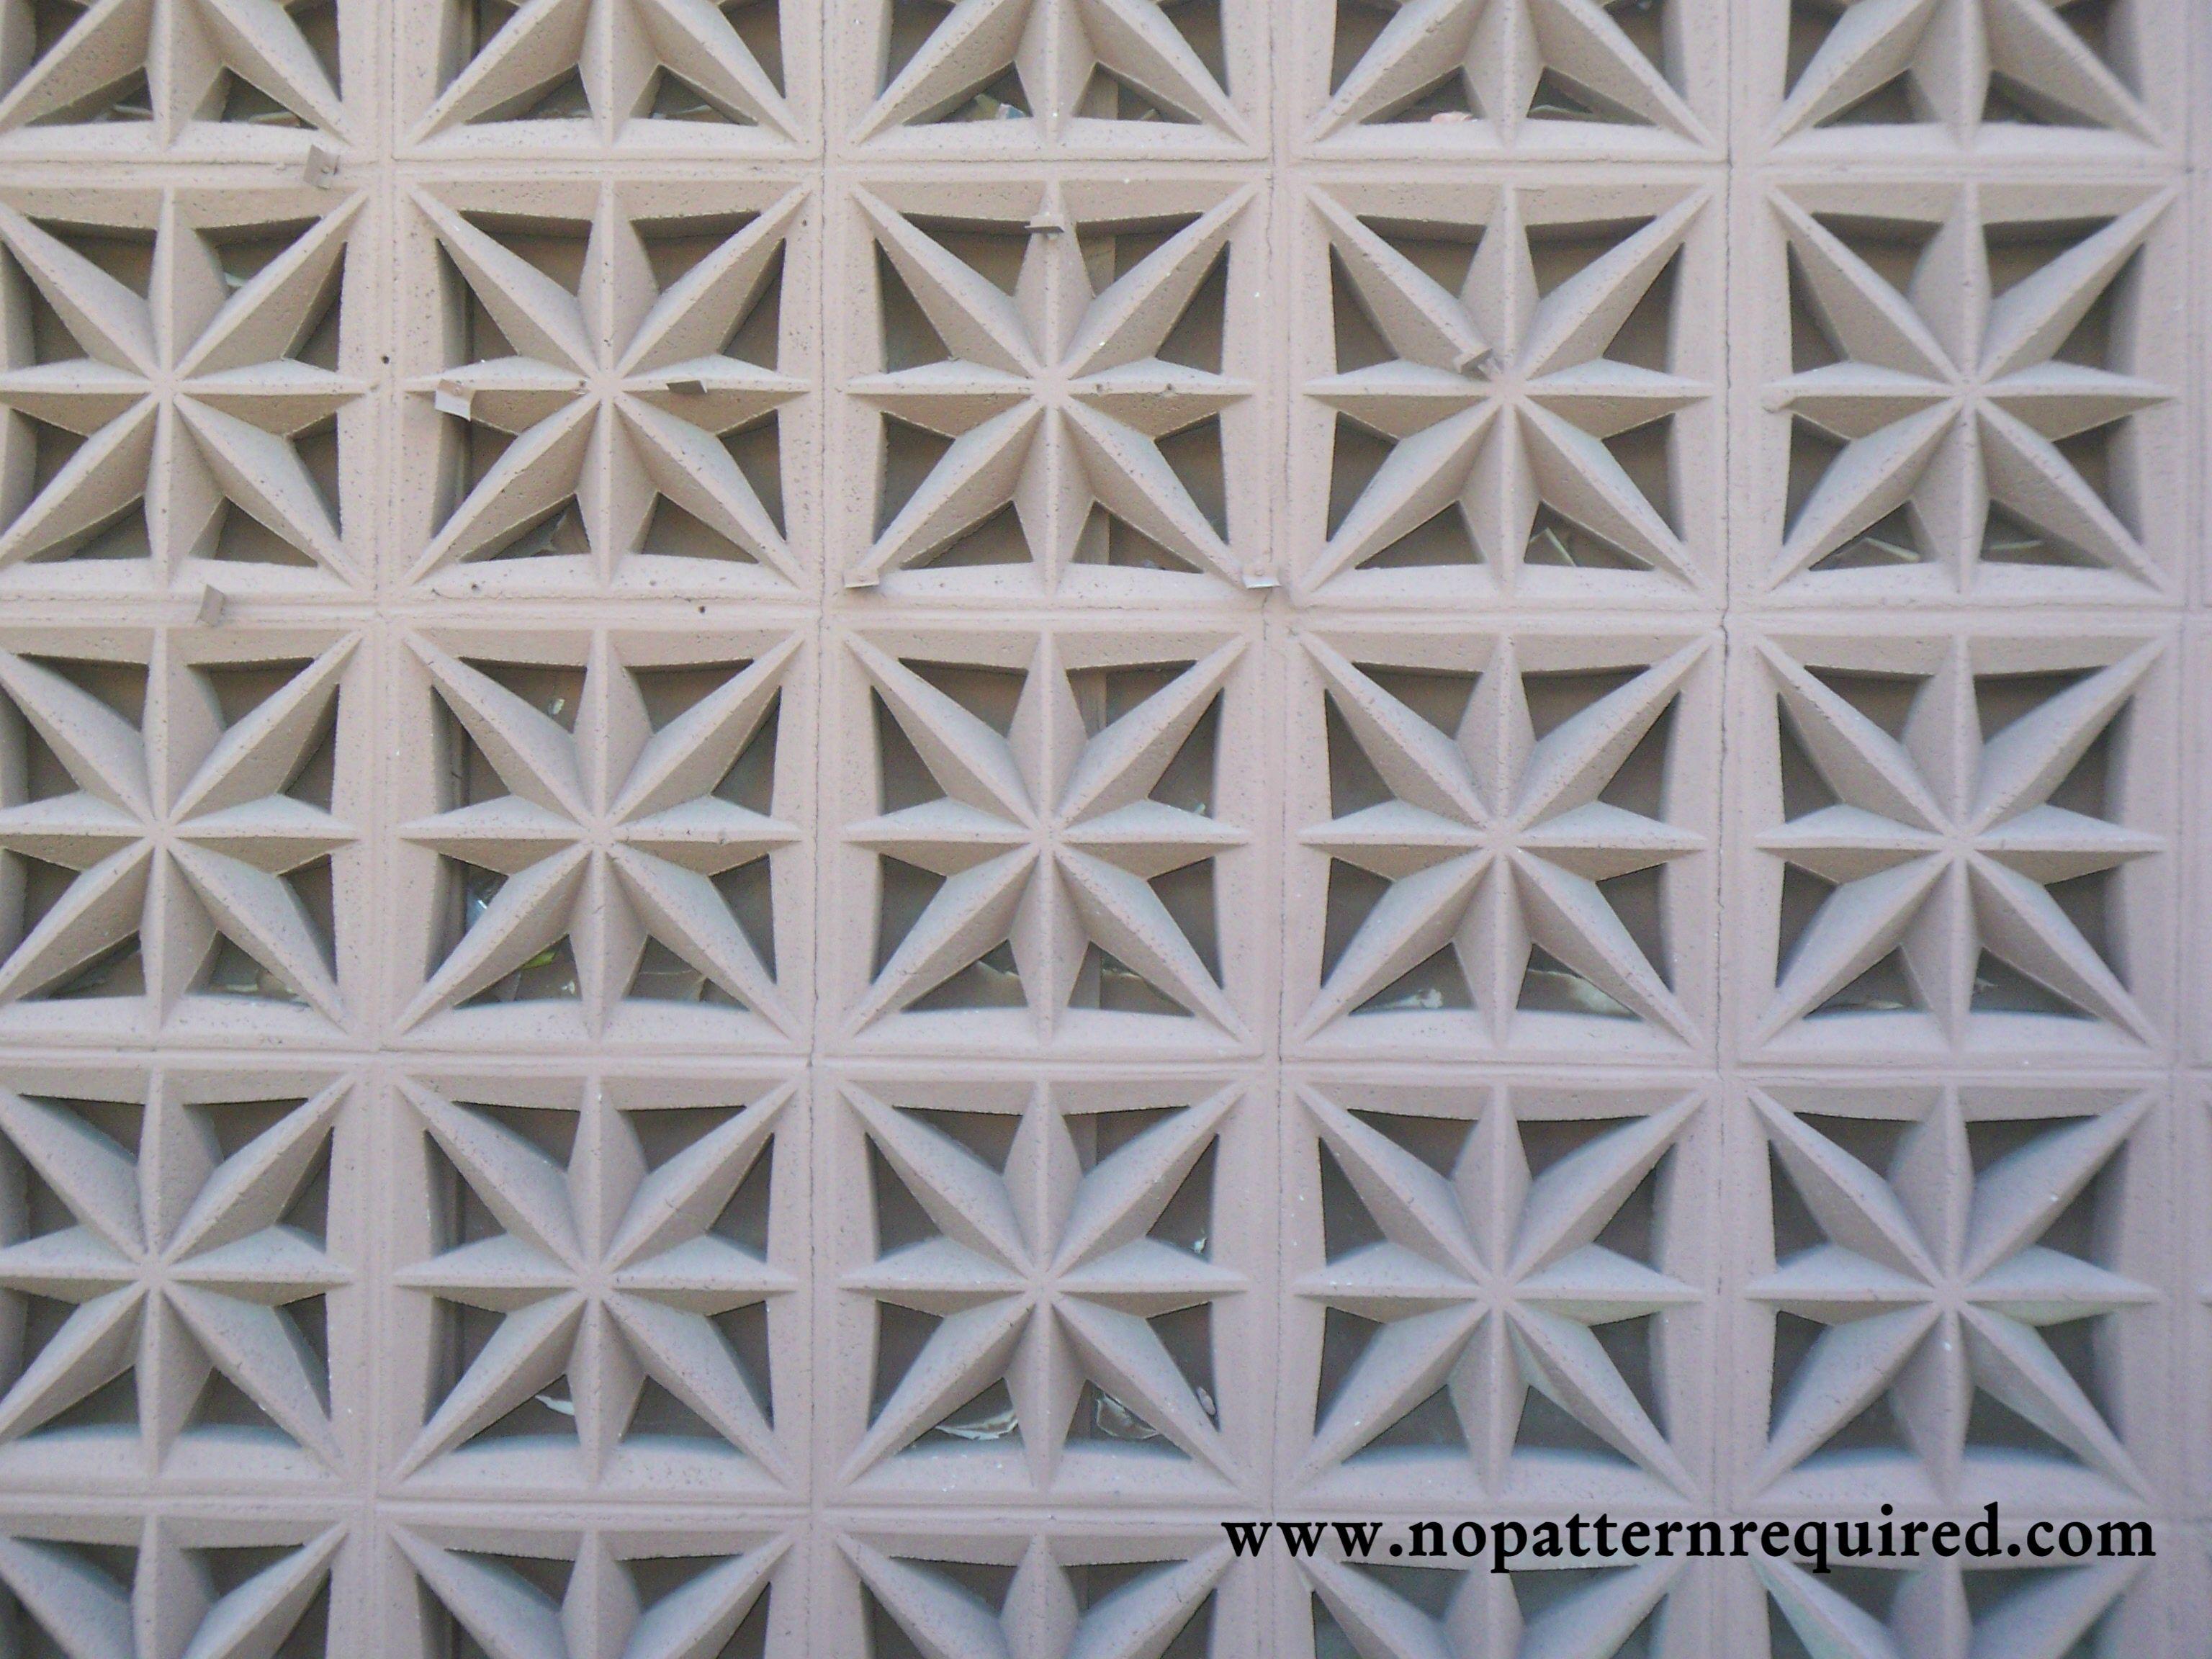 Alluring Lowes Cinder Blocks For Captivating Outdoor Decoration Ideas Lowes Cinder Blocks With Star Patt Concrete Decor Decorative Concrete Walls Screen Block